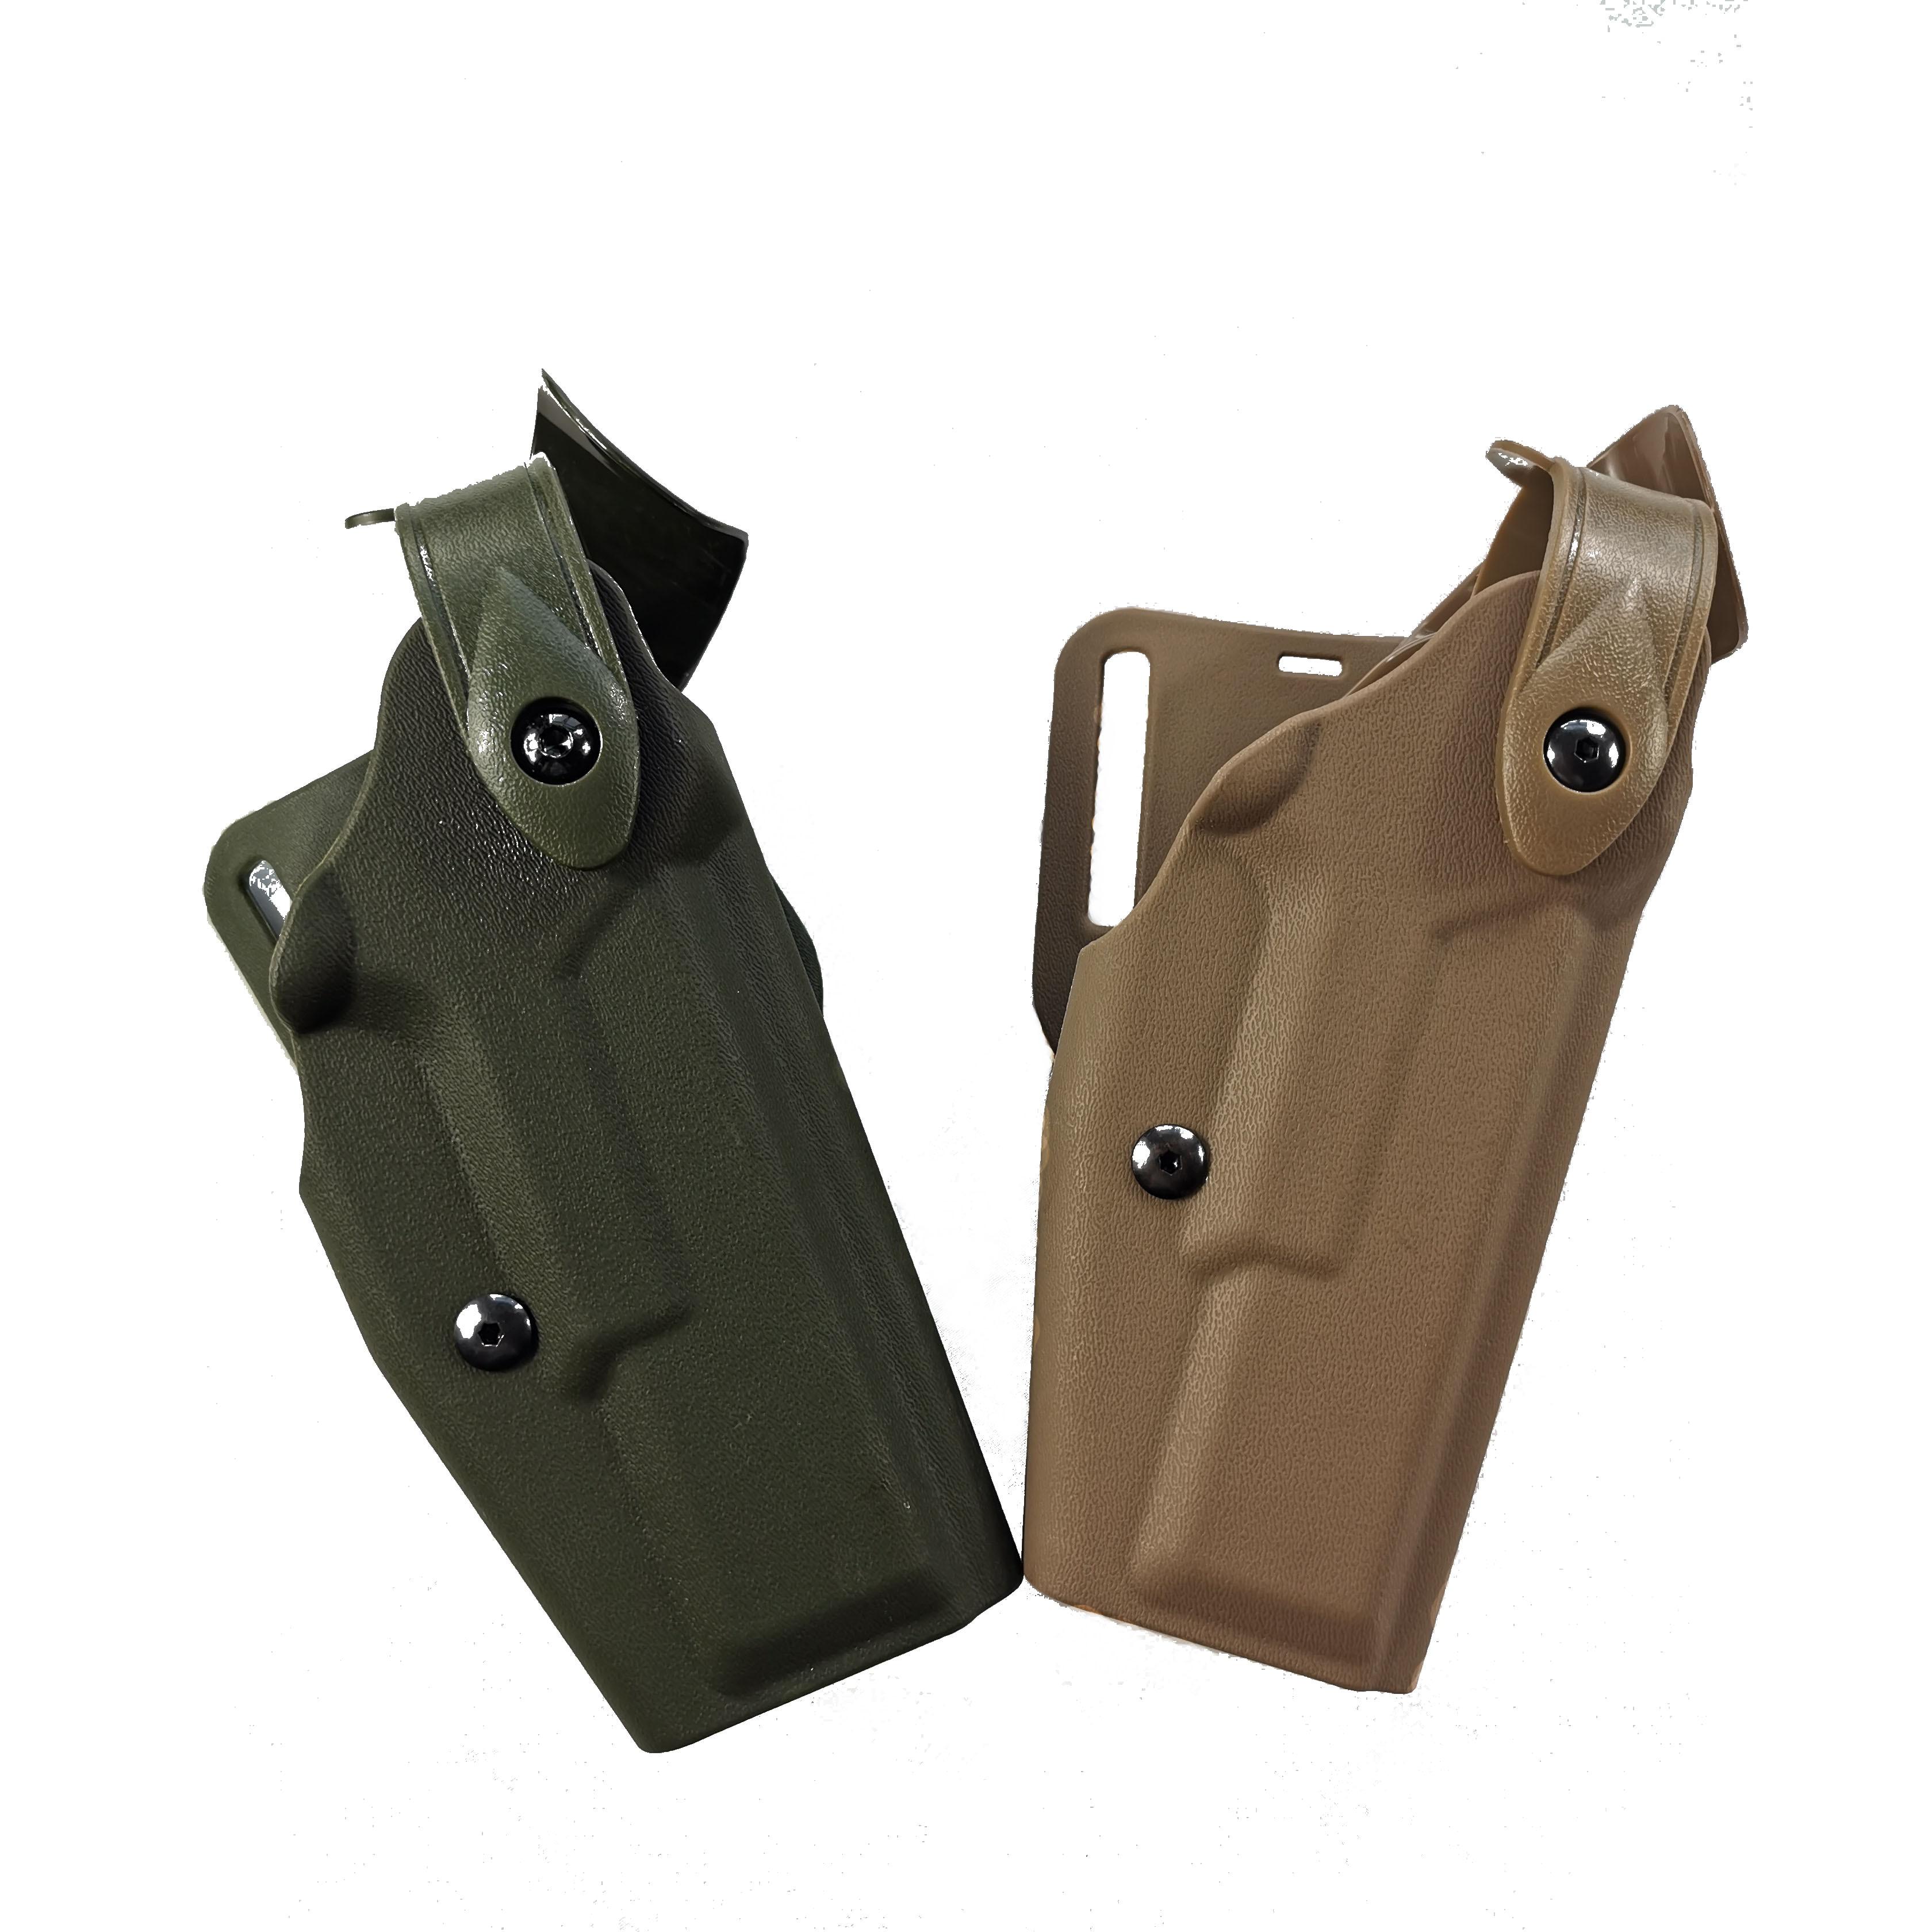 Safariland tactique polyuréthane Glockck ceinture Holster Gl0ck pistolet taille Holster Glock 17 19 22 23 31 32 Airsoft pistolet Holster